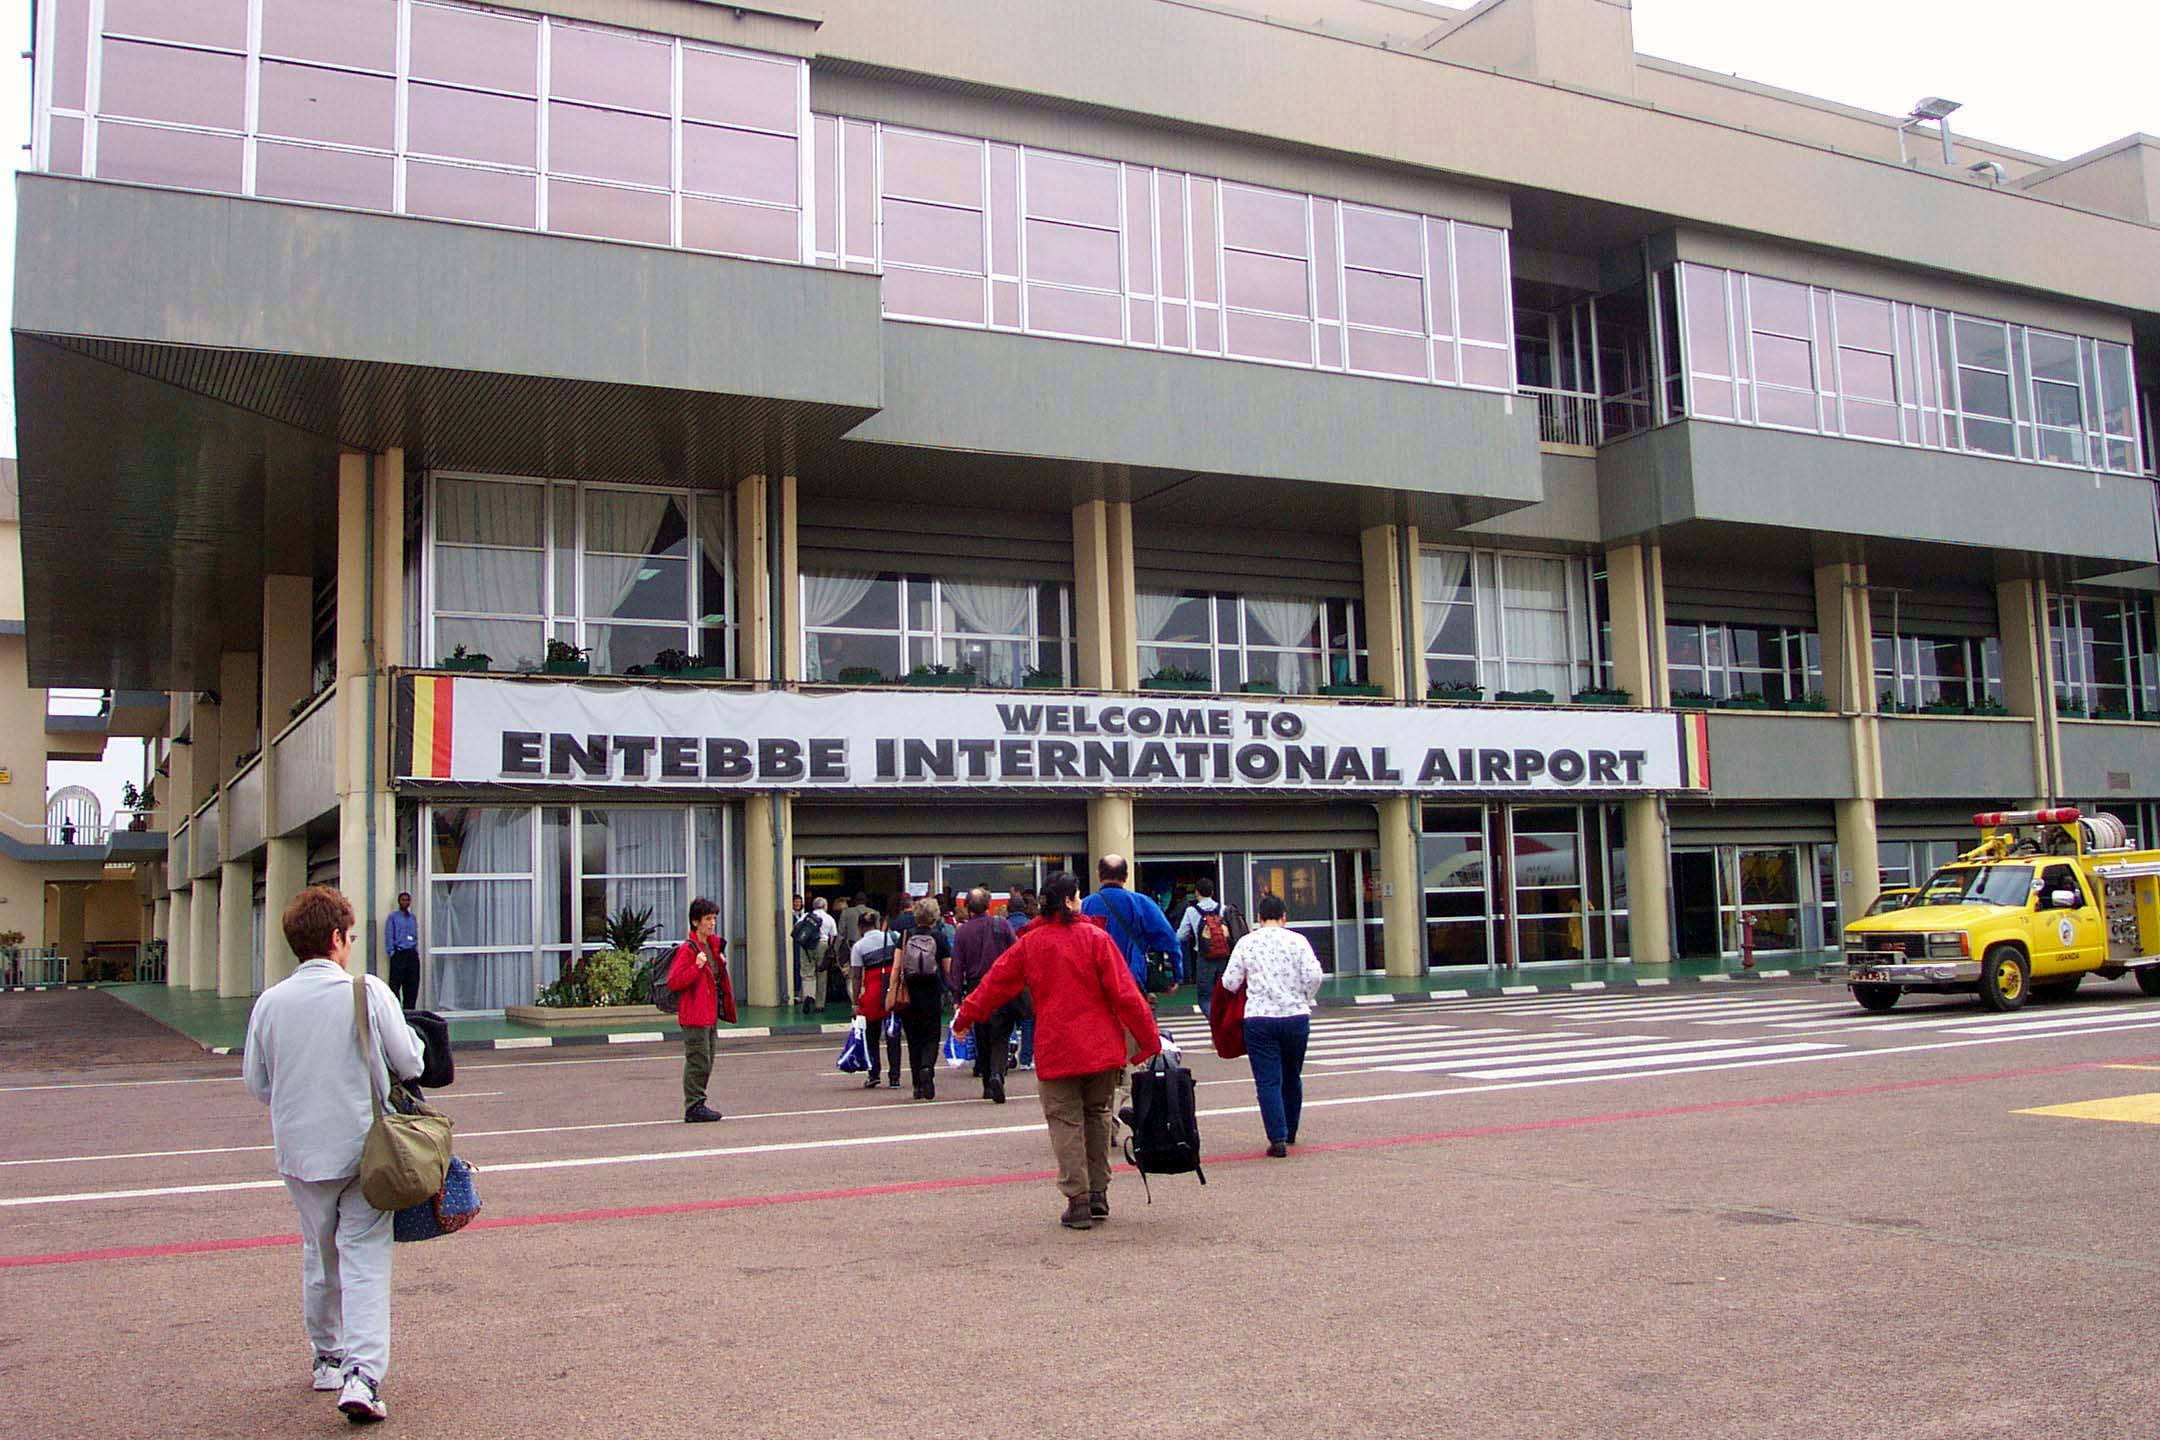 аэропорт Энтеббе